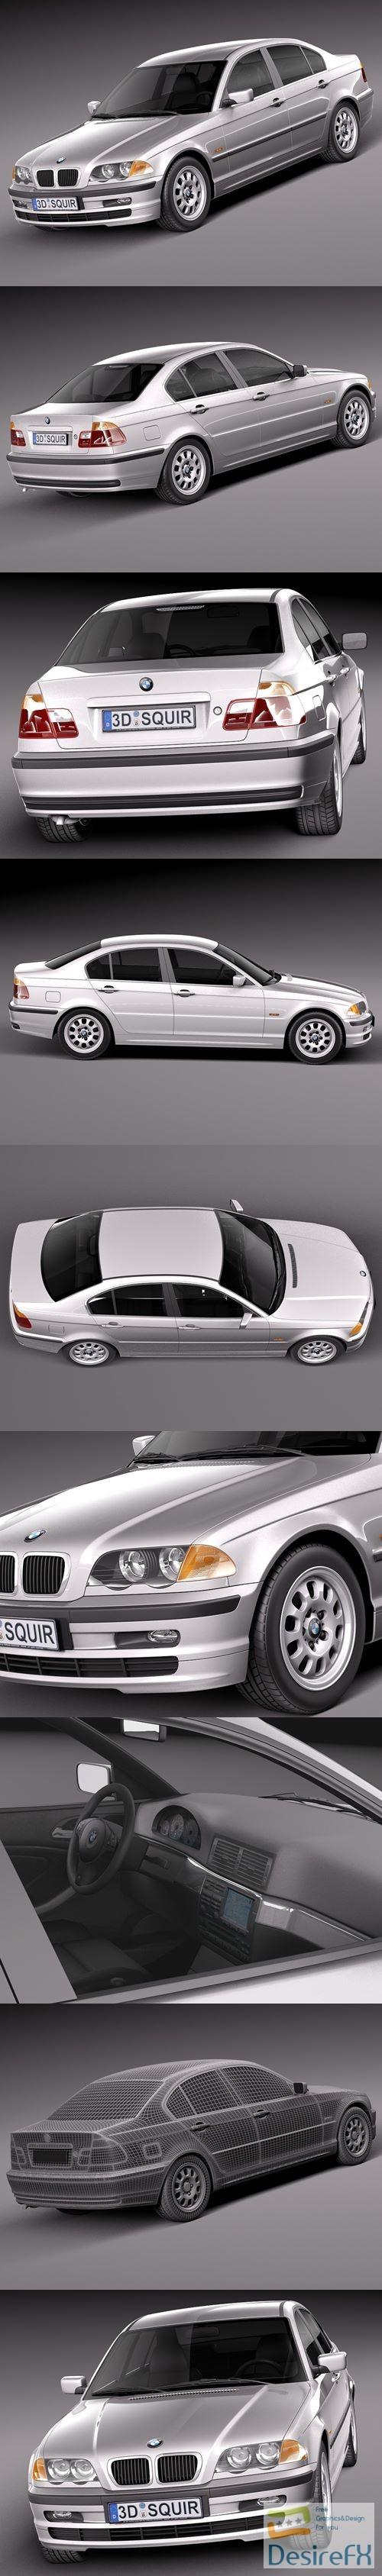 BMW 3-series e46 1998-2001 sedan 3D Model